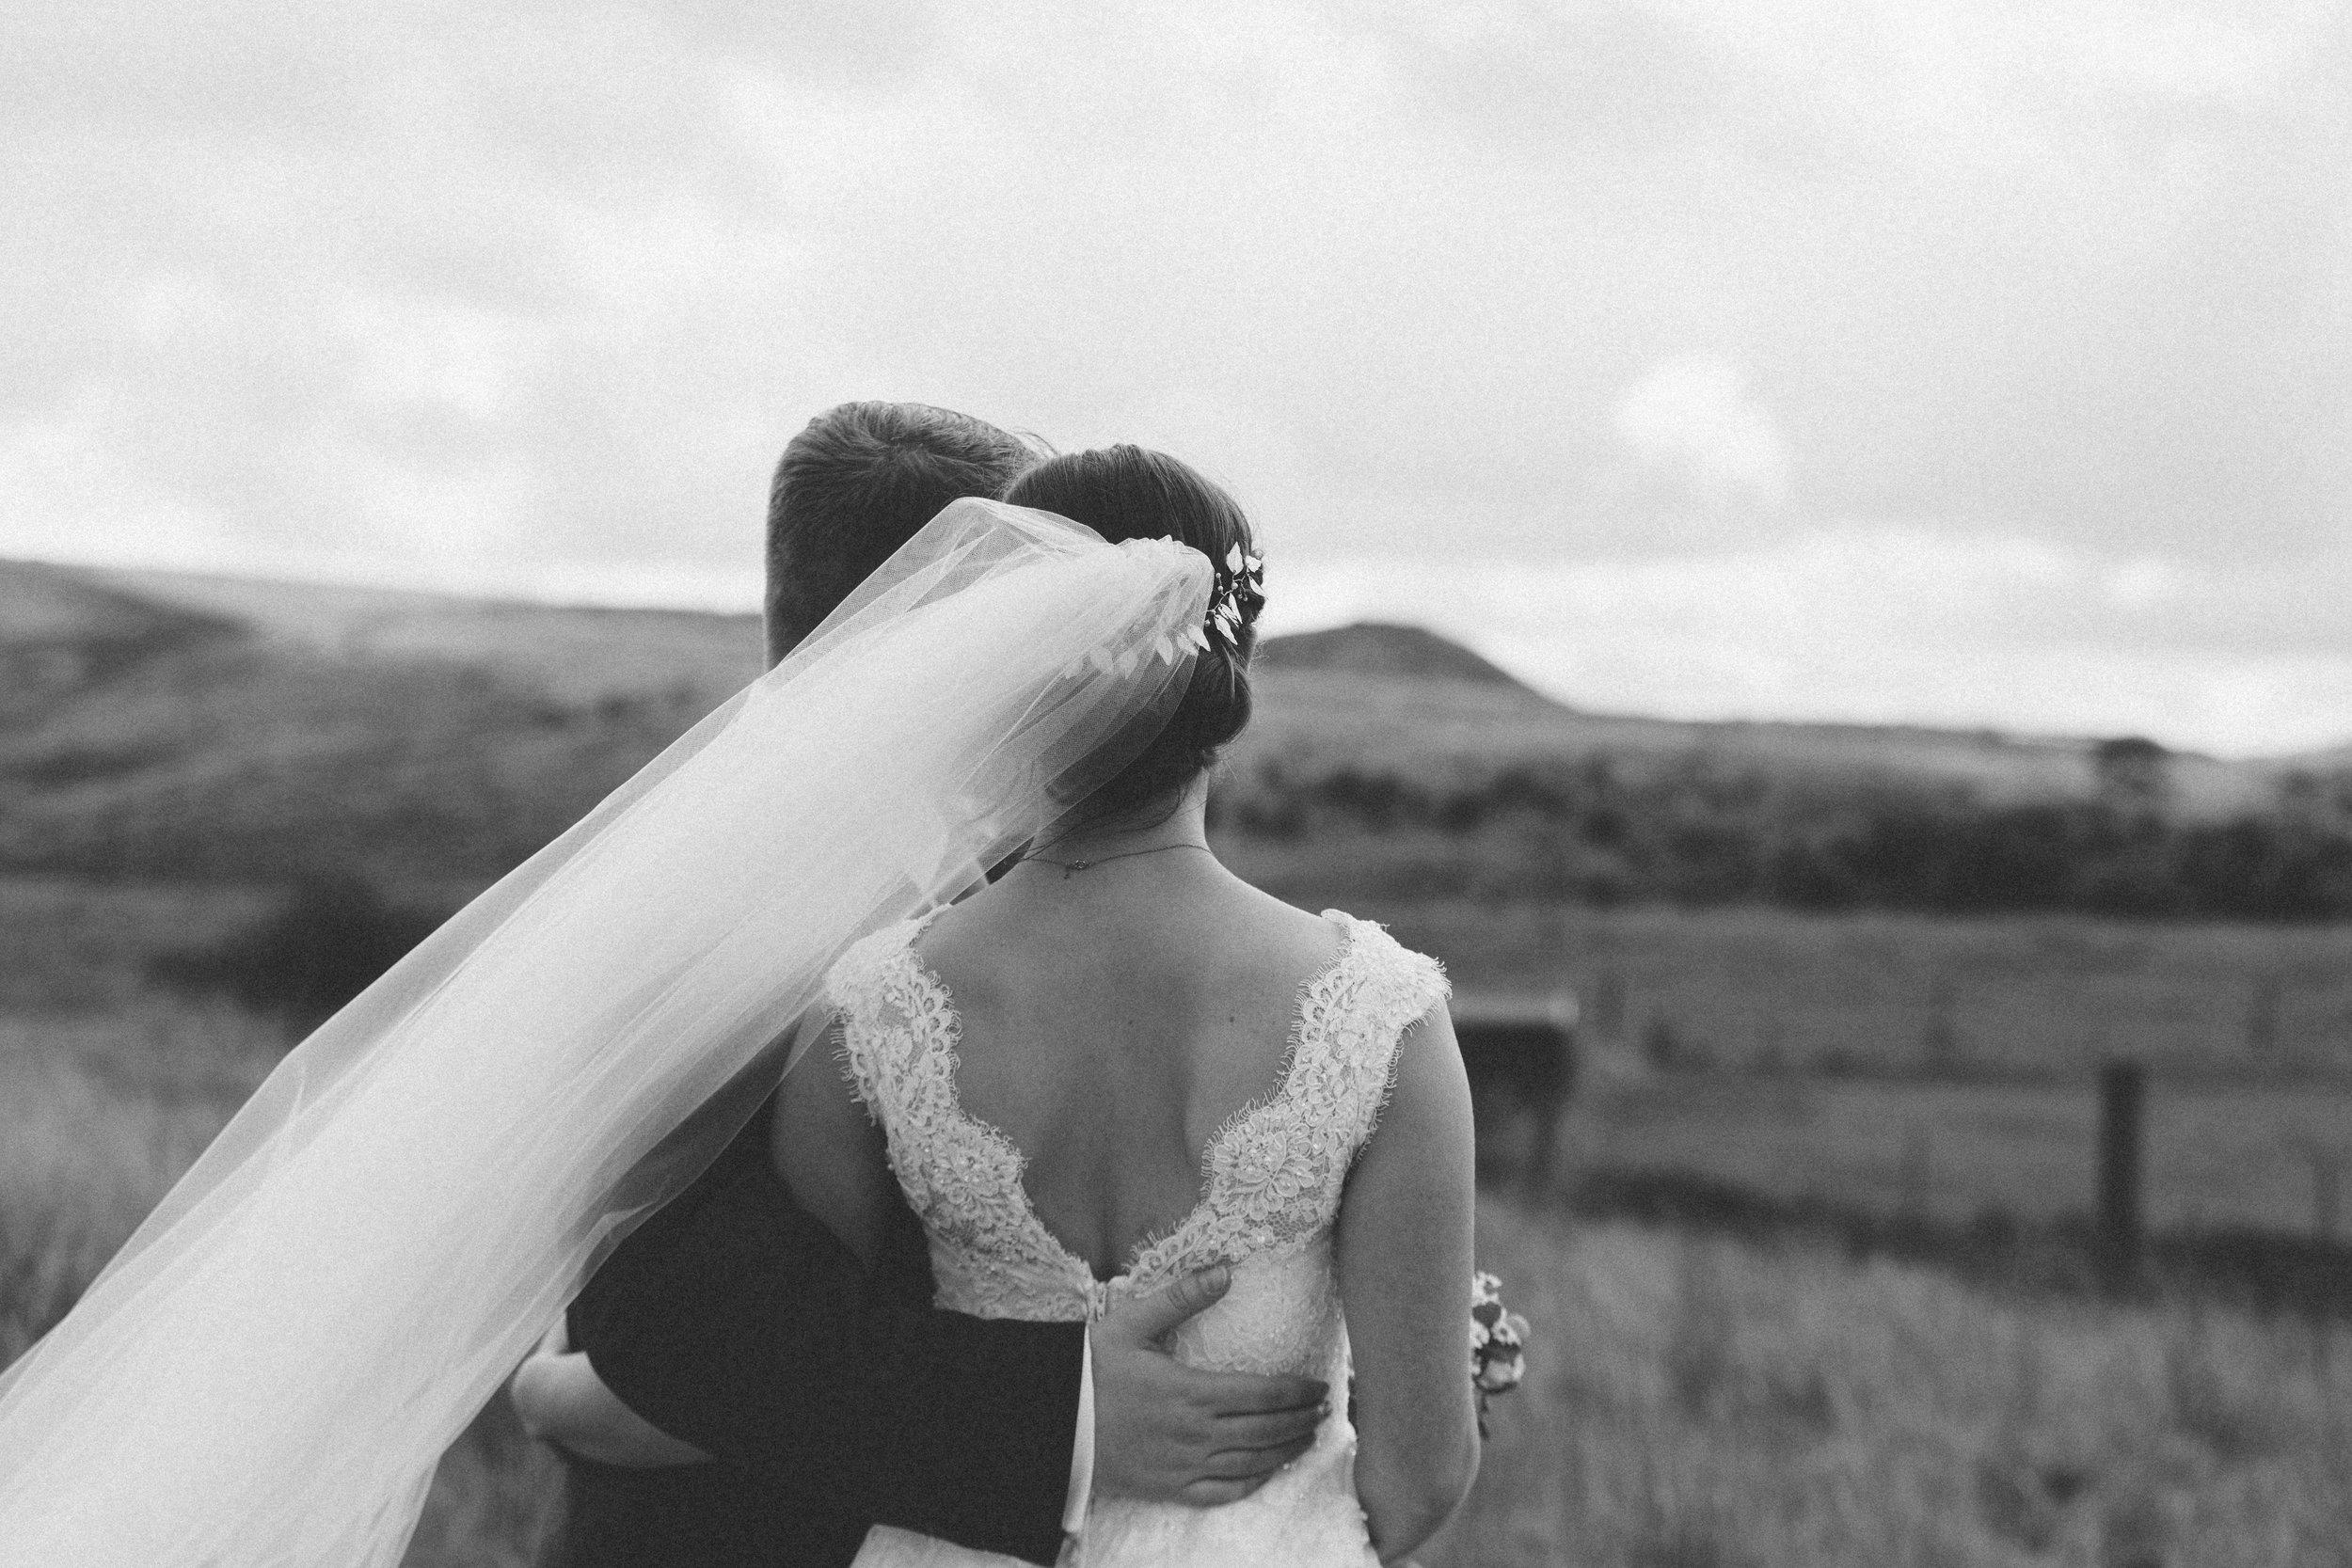 Kathryn-and-Mike-Wedding-Highlights-65.jpg